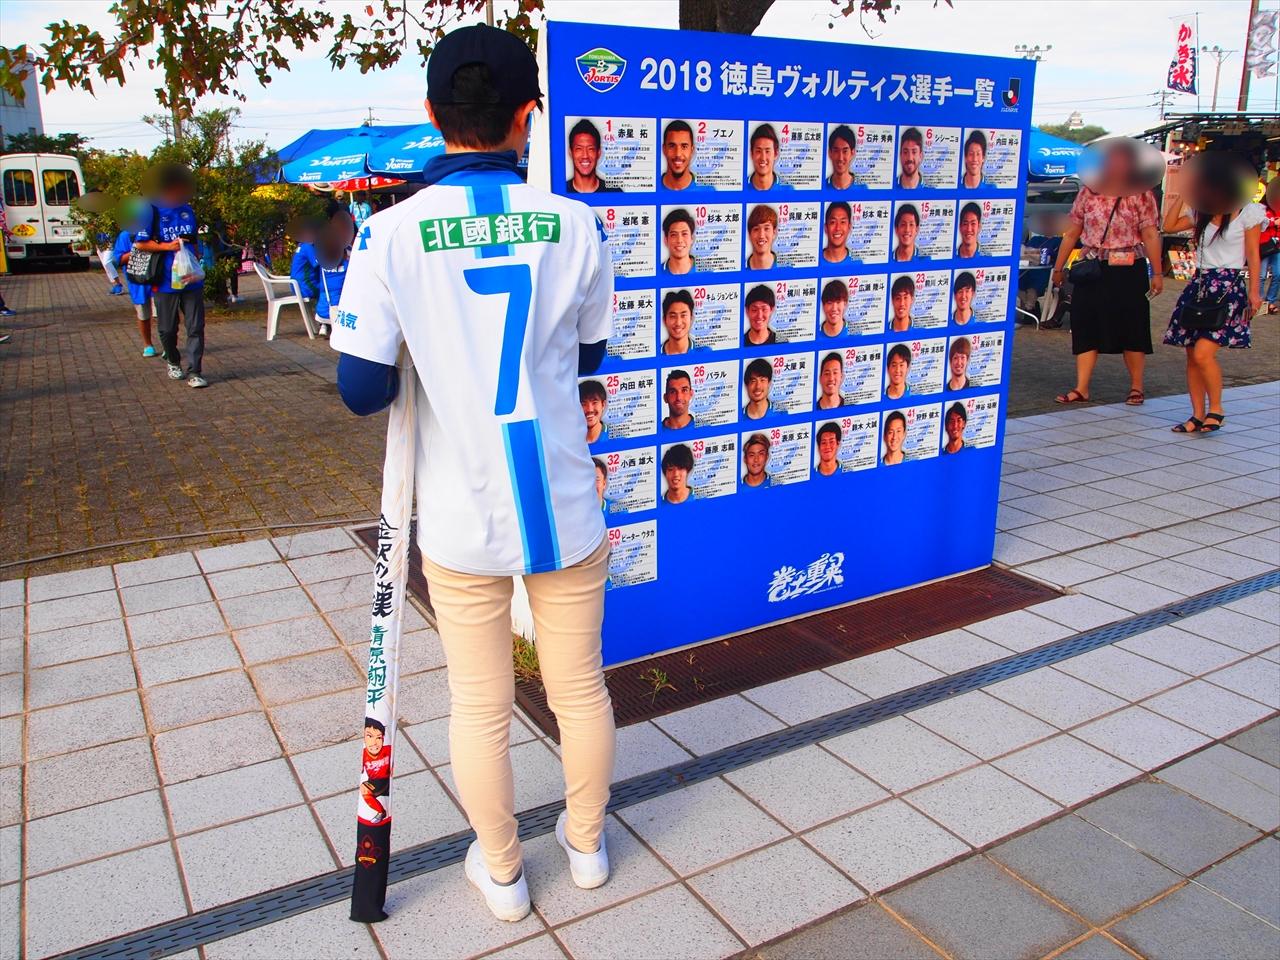 個サポ 金沢 徳島 セレッソ大阪 清原翔平